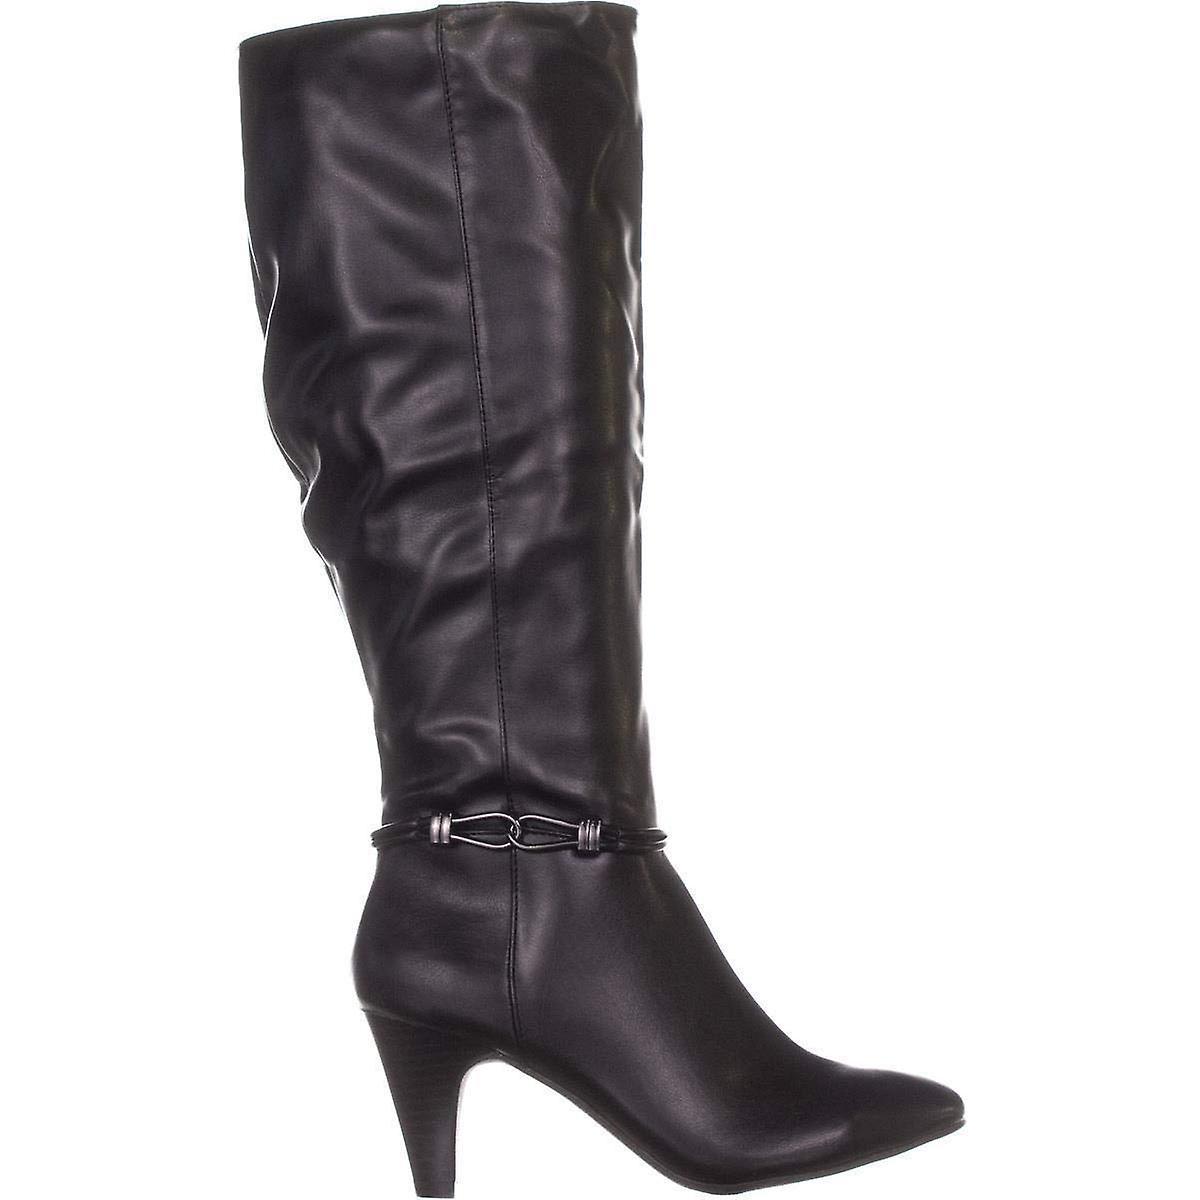 Karen Scott Womens Wc Hollee Almond Toe Knee High Fashion Boots